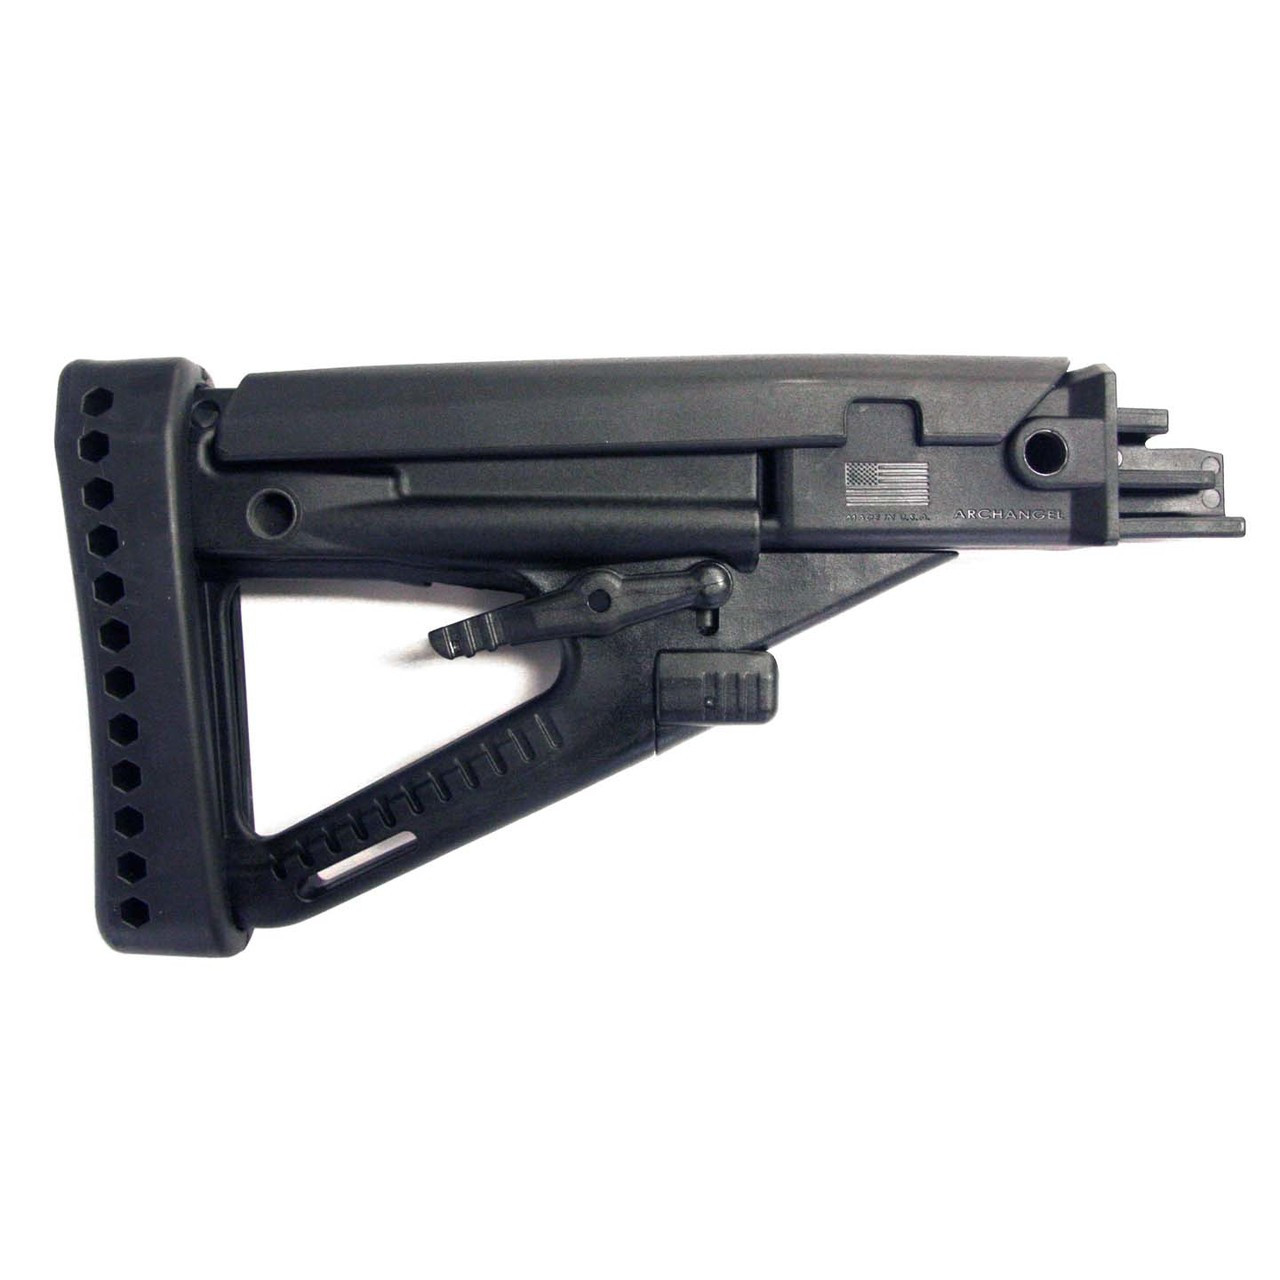 Archangel® OPFOR® AK-series (4) Position Adjustable Buttstock - Black Polymer